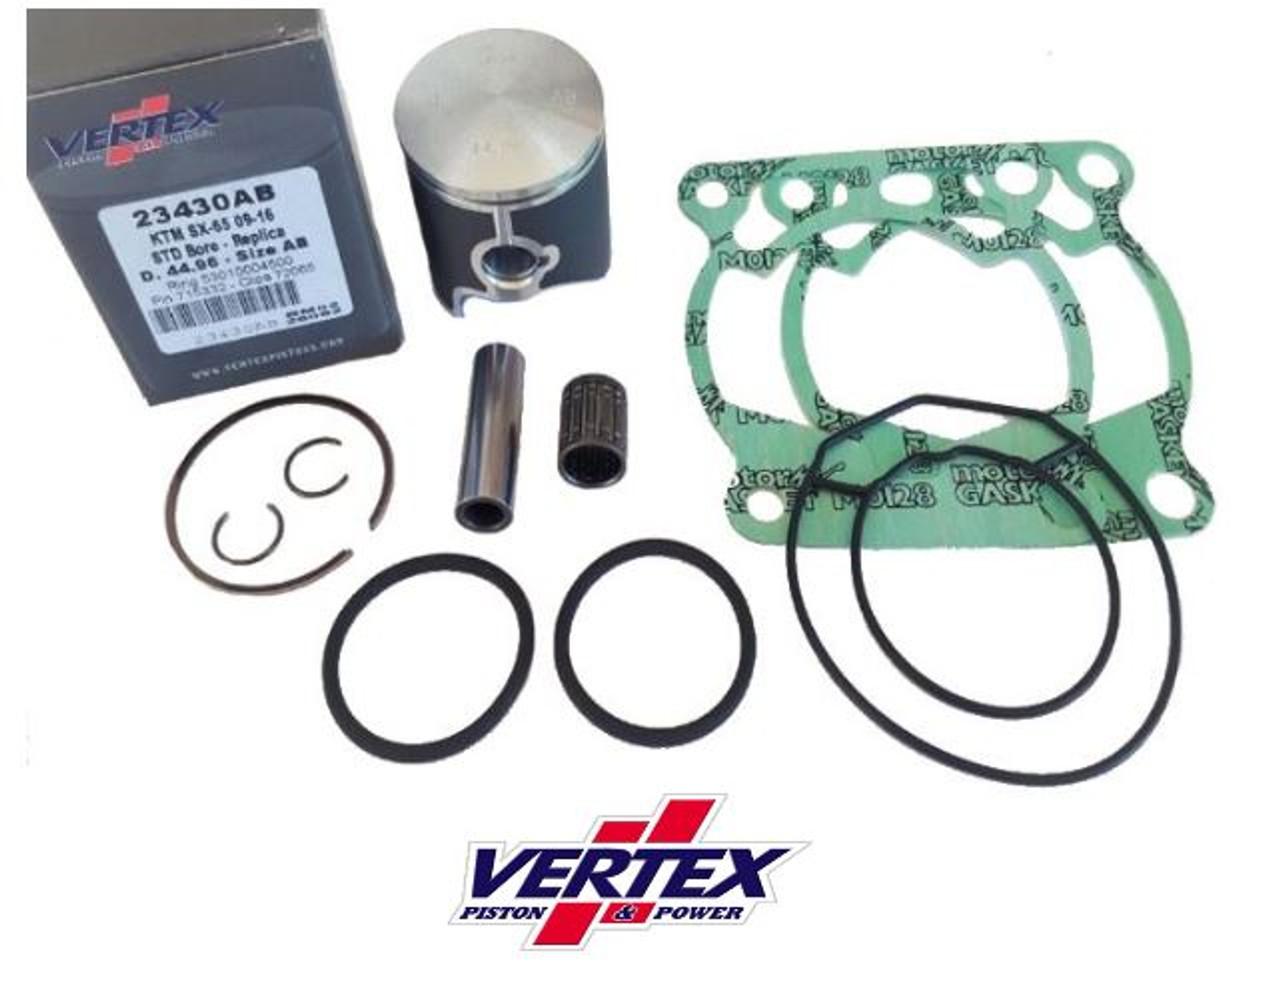 Vertex-Winderosa 23430AB Replica Piston Kit